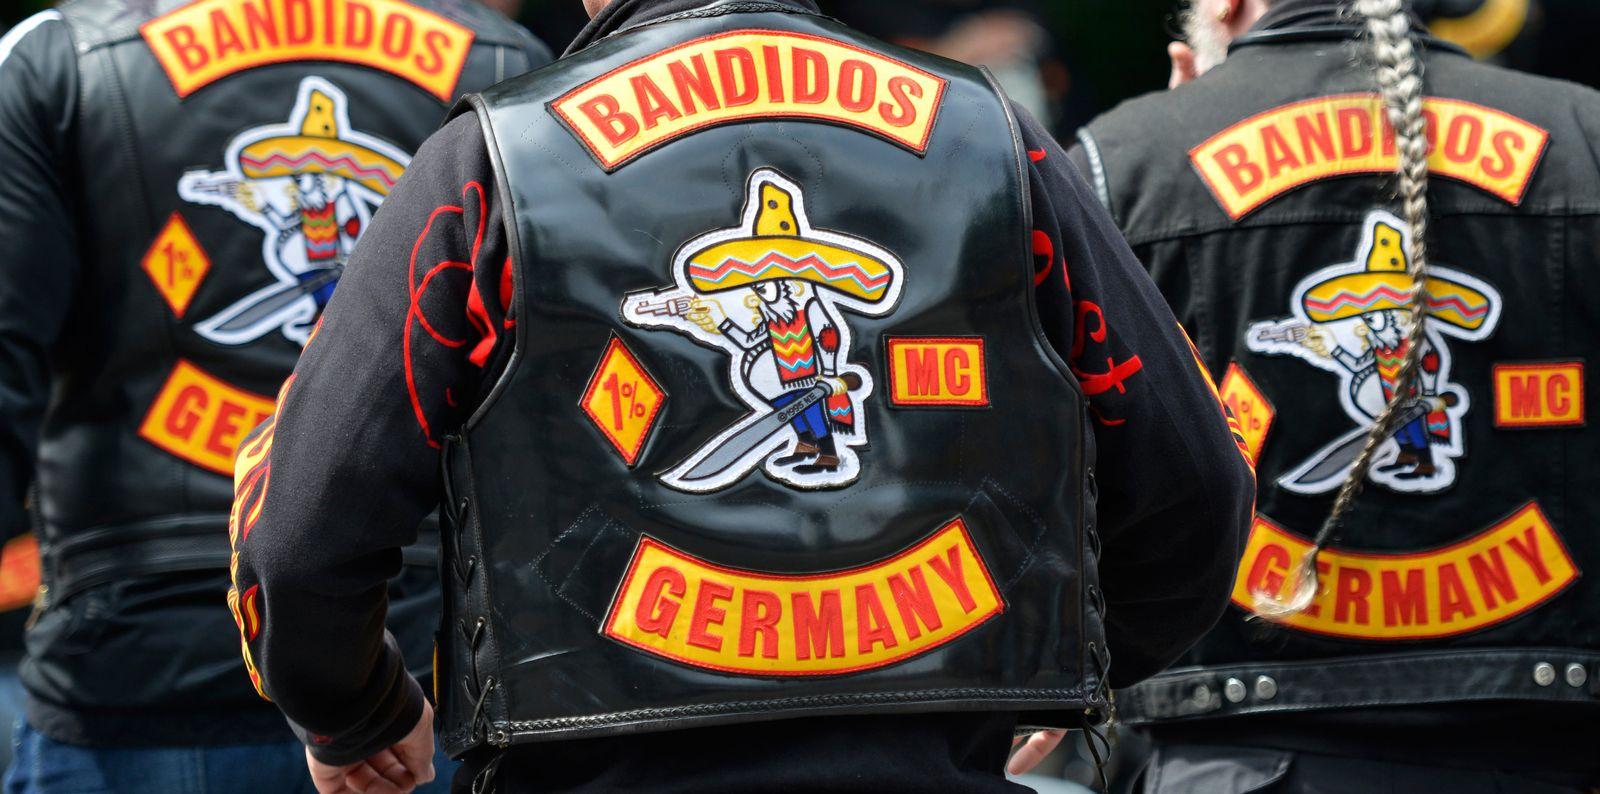 Symboldbild SEO/ Bandidos